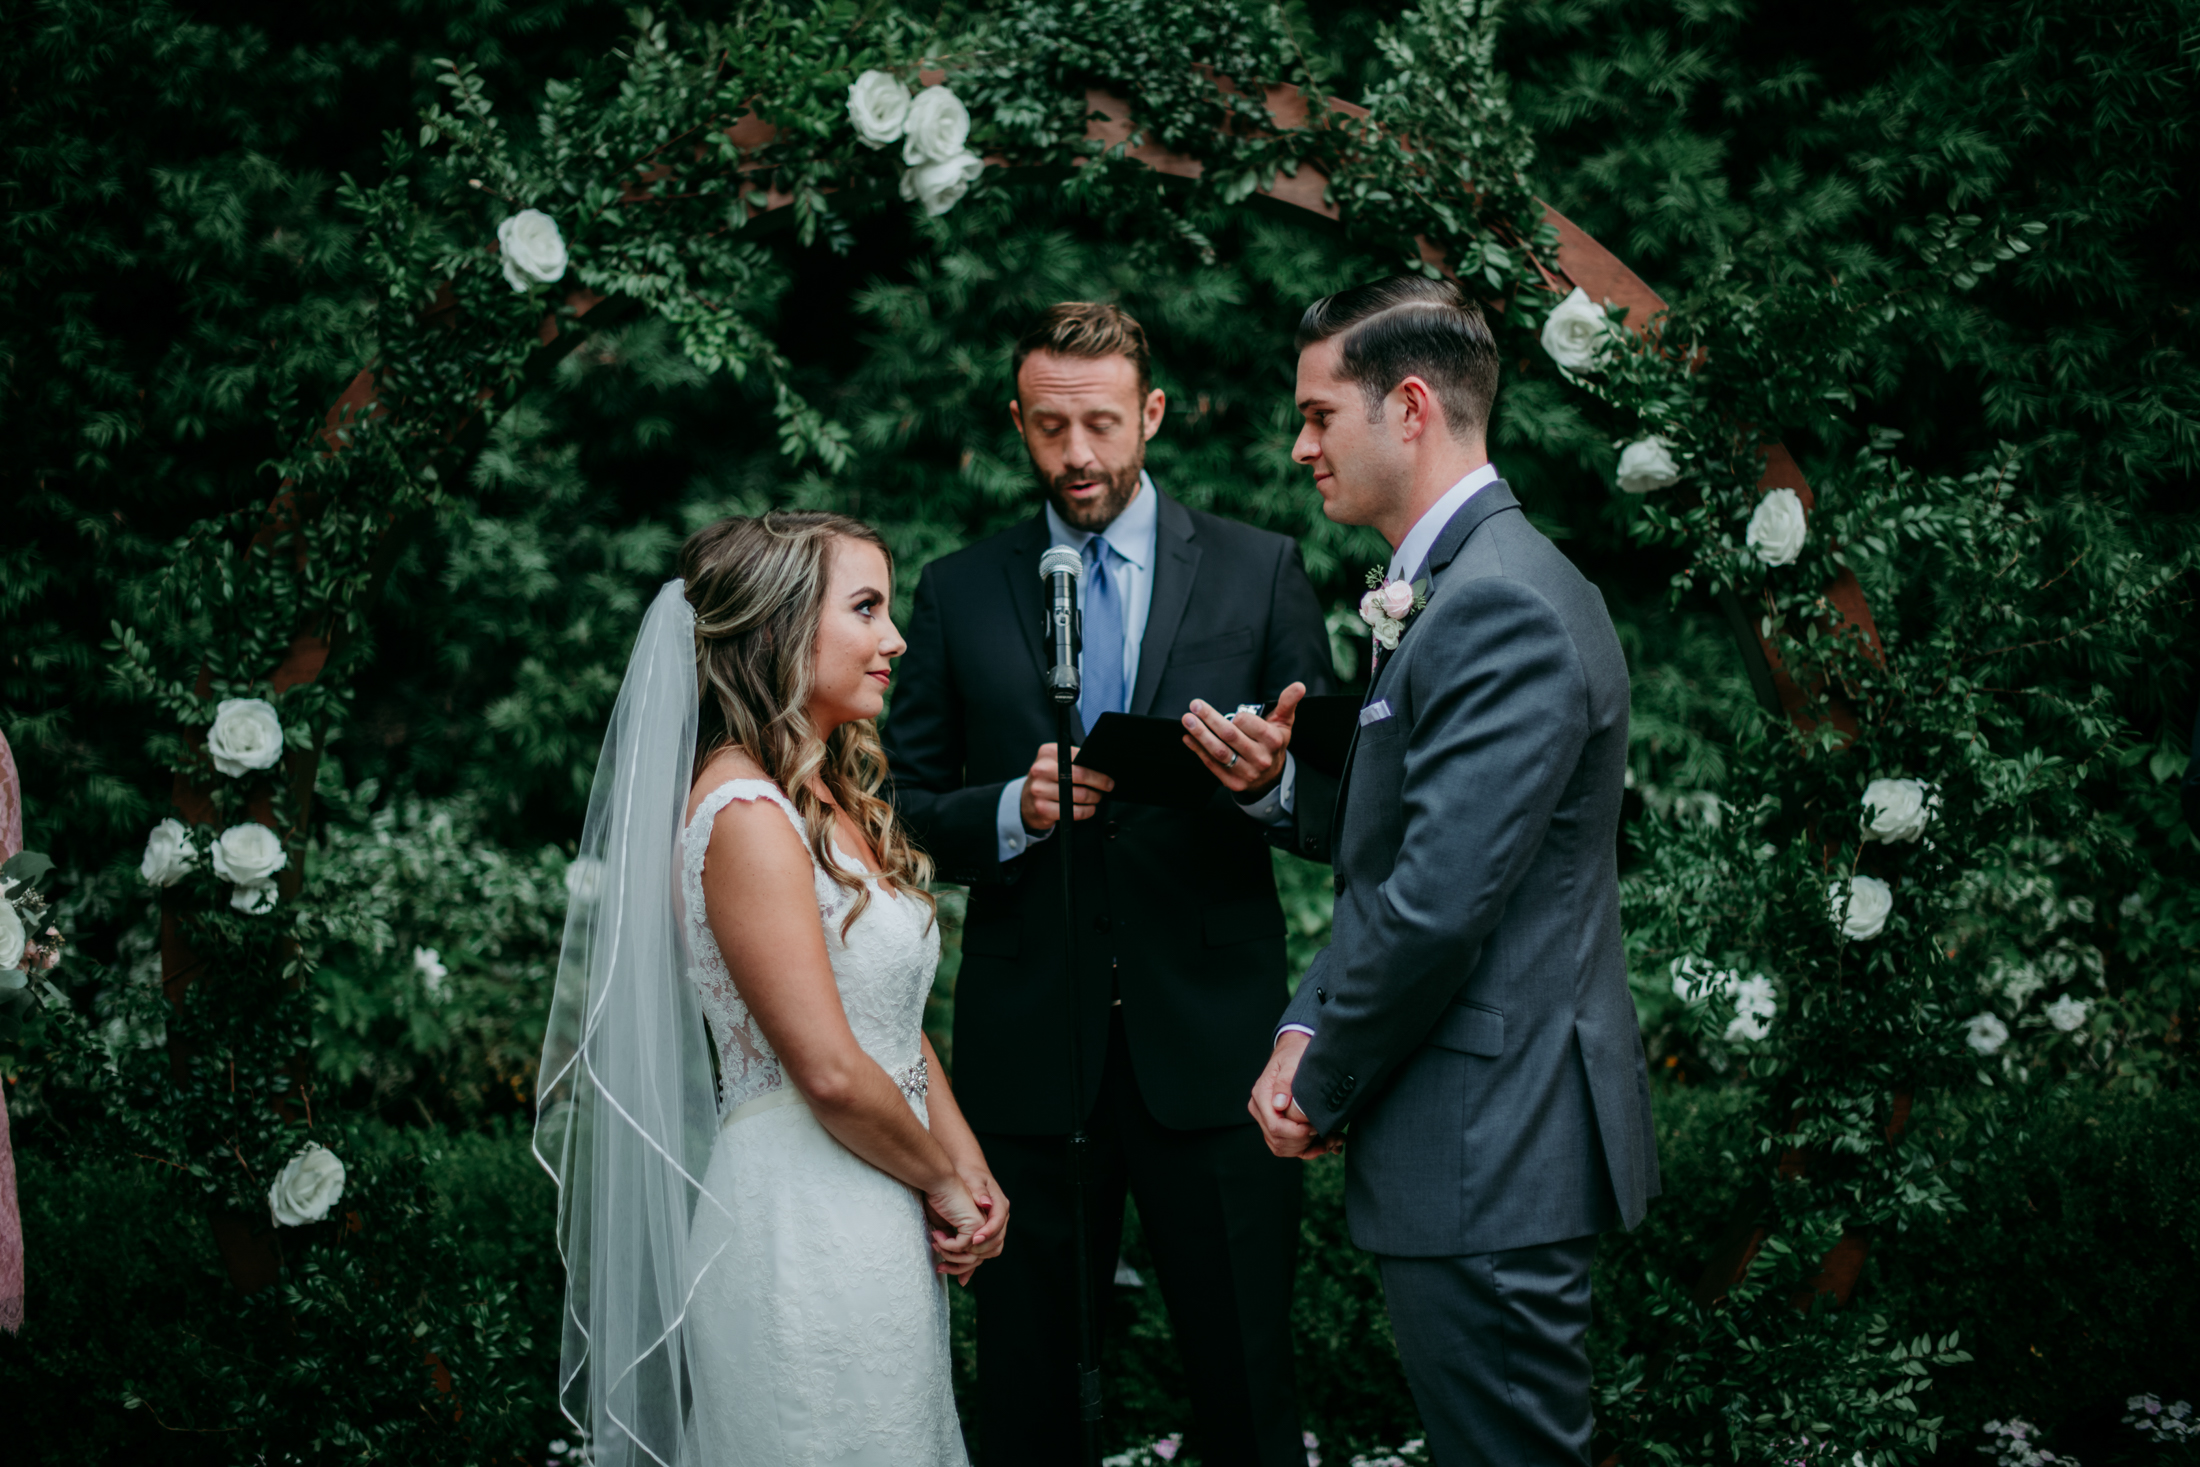 franciscan_garden_wedding-42.jpg